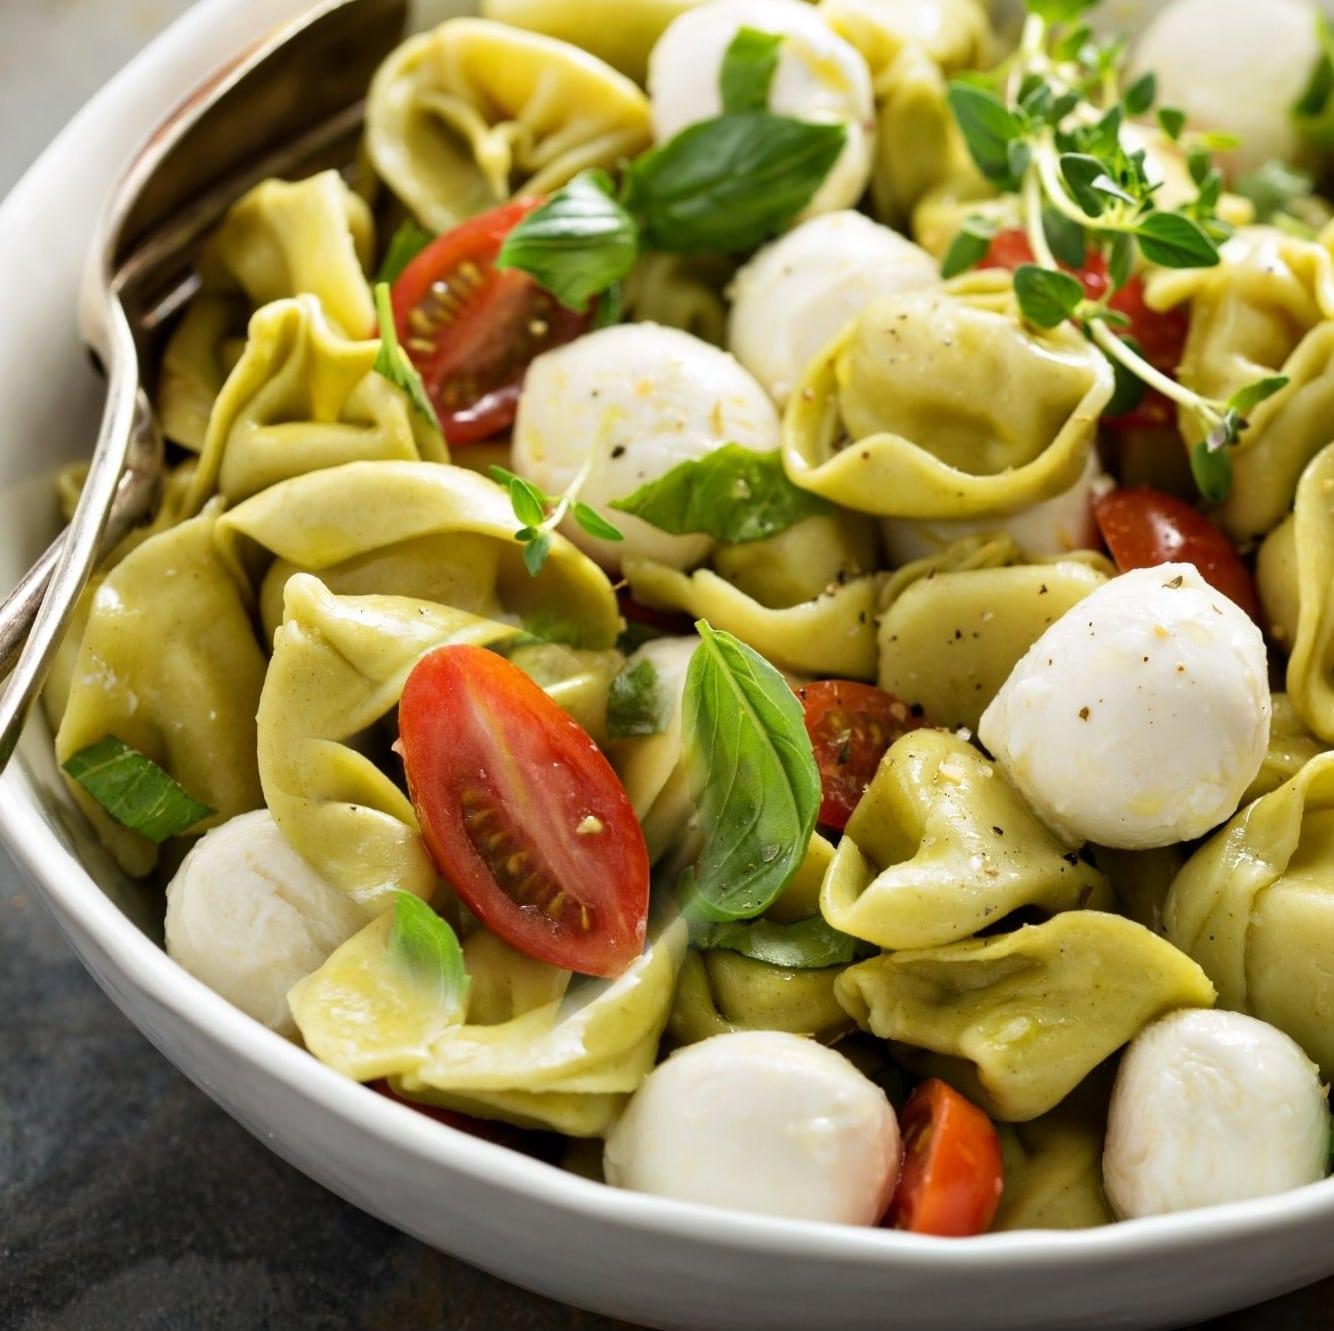 tortellini pasta salad ith tomatoes and fresh basil